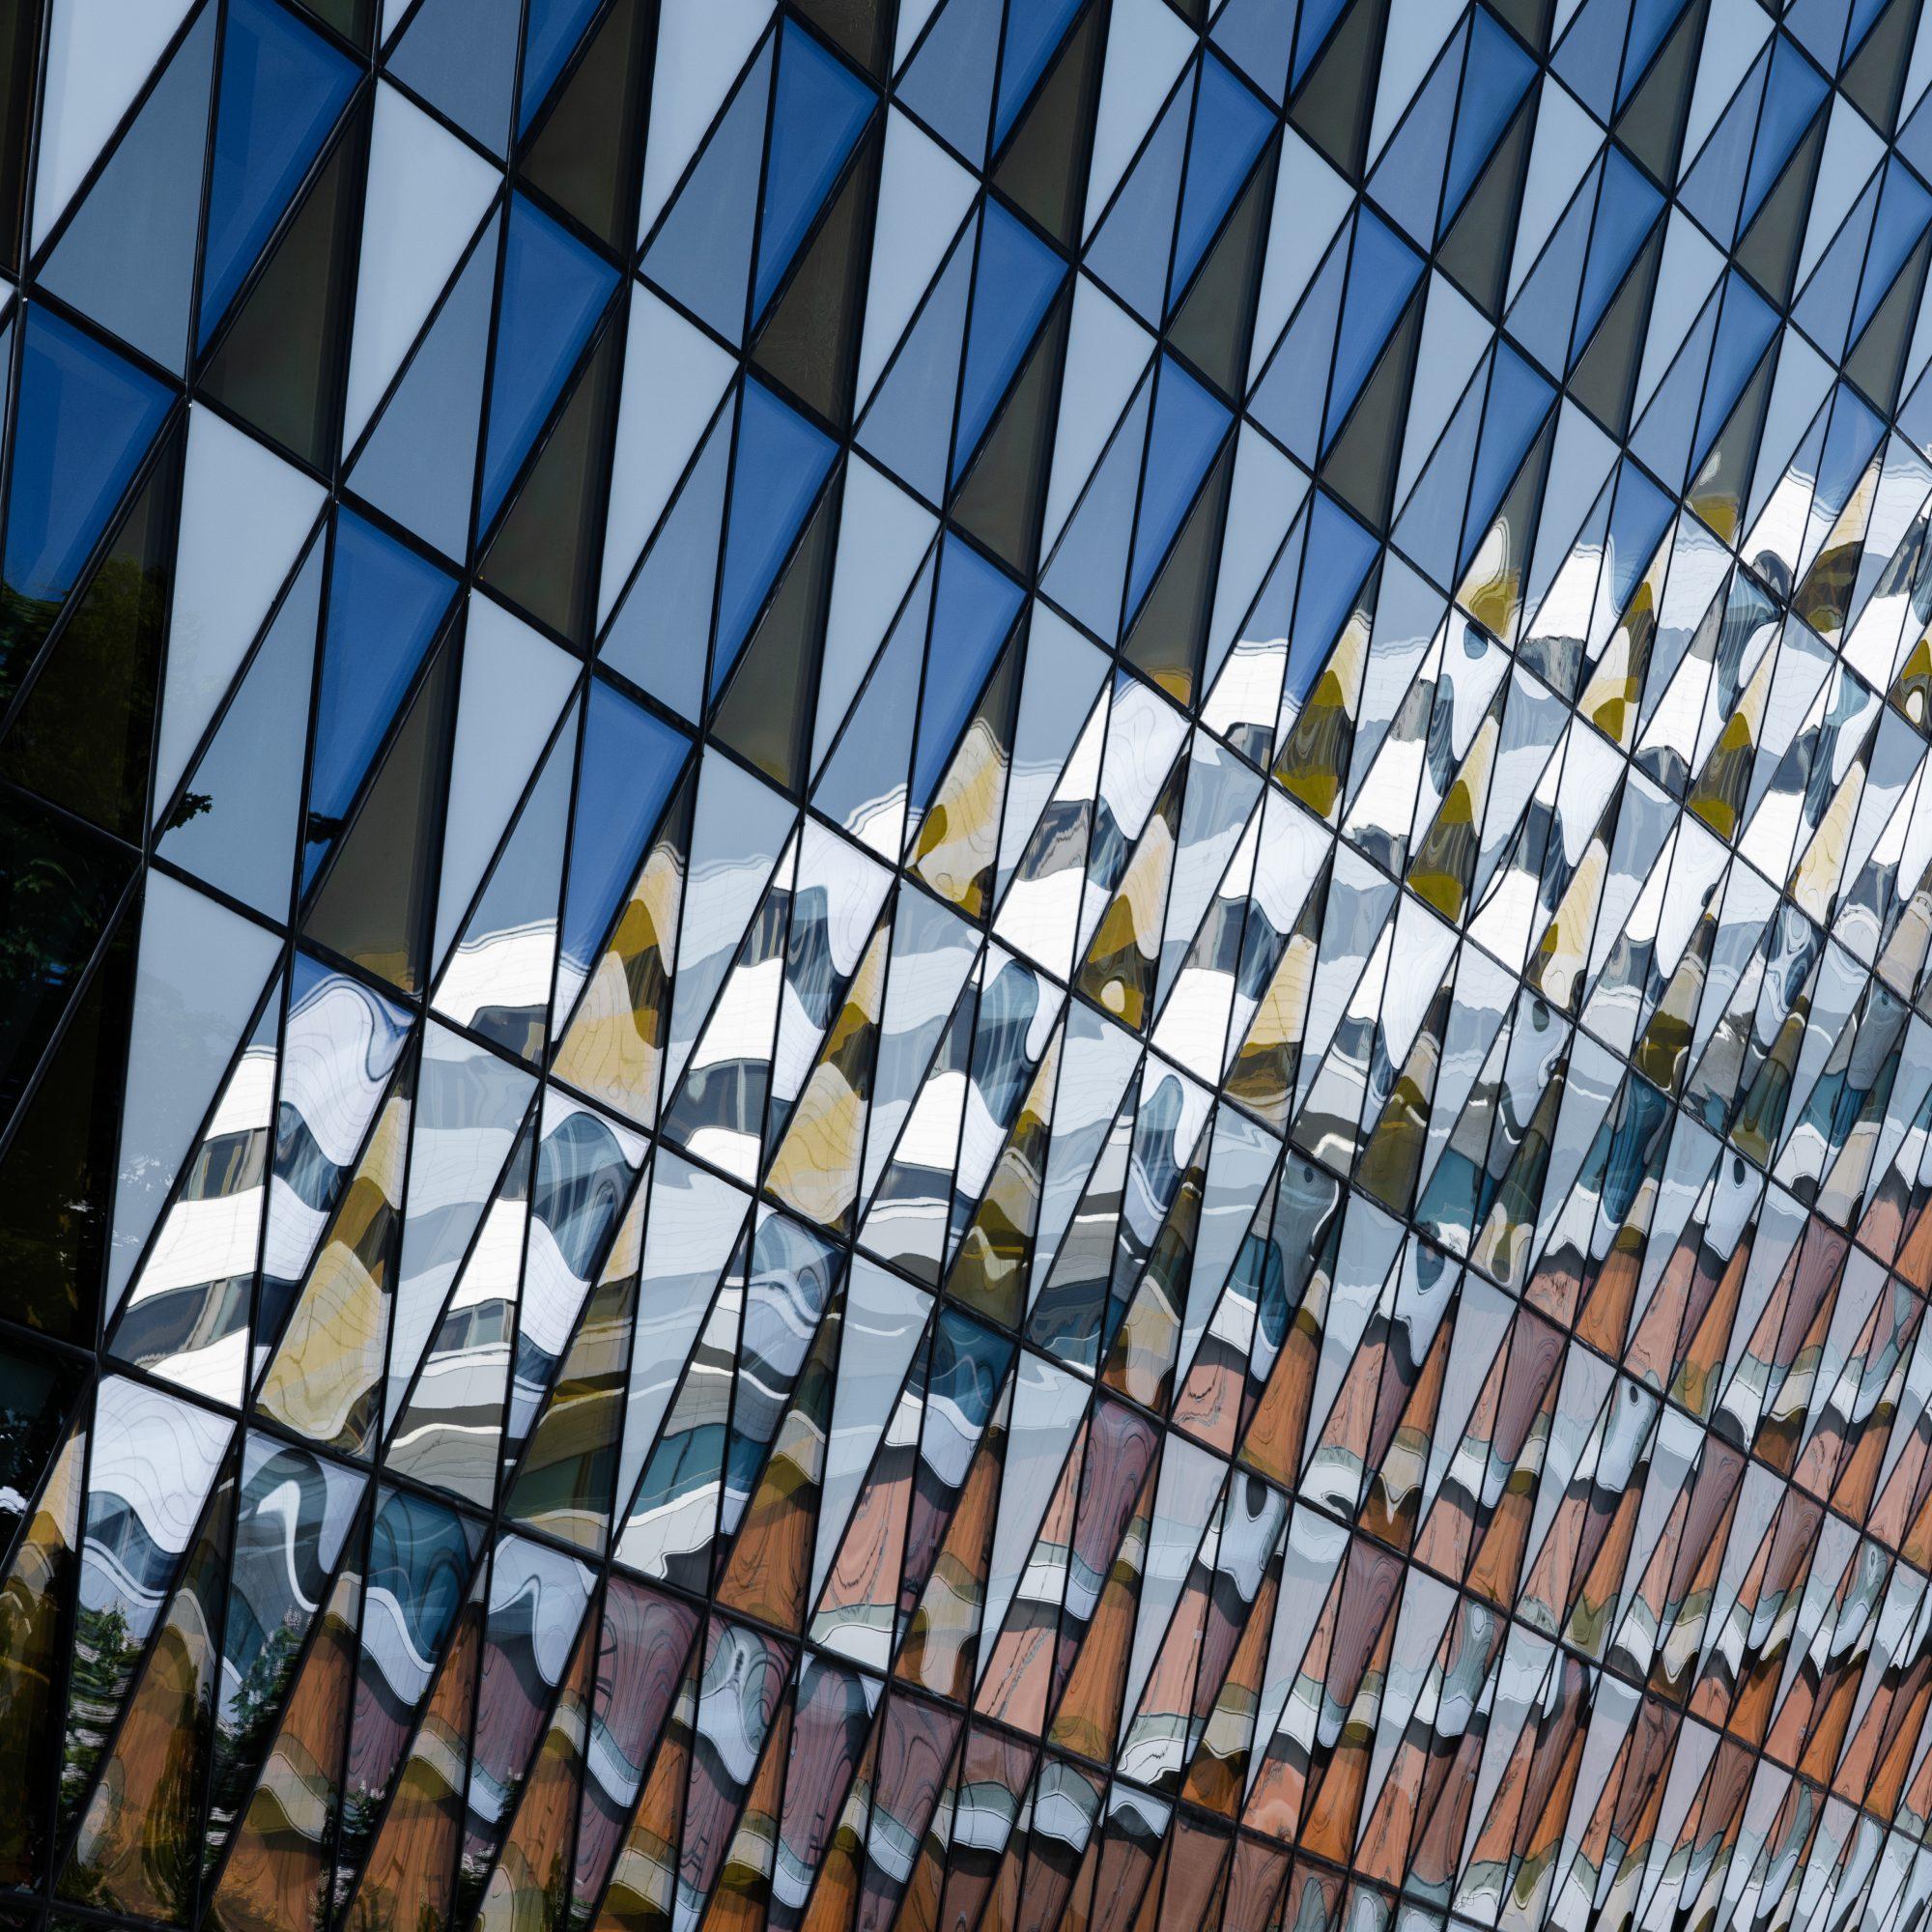 Reflections on house facade